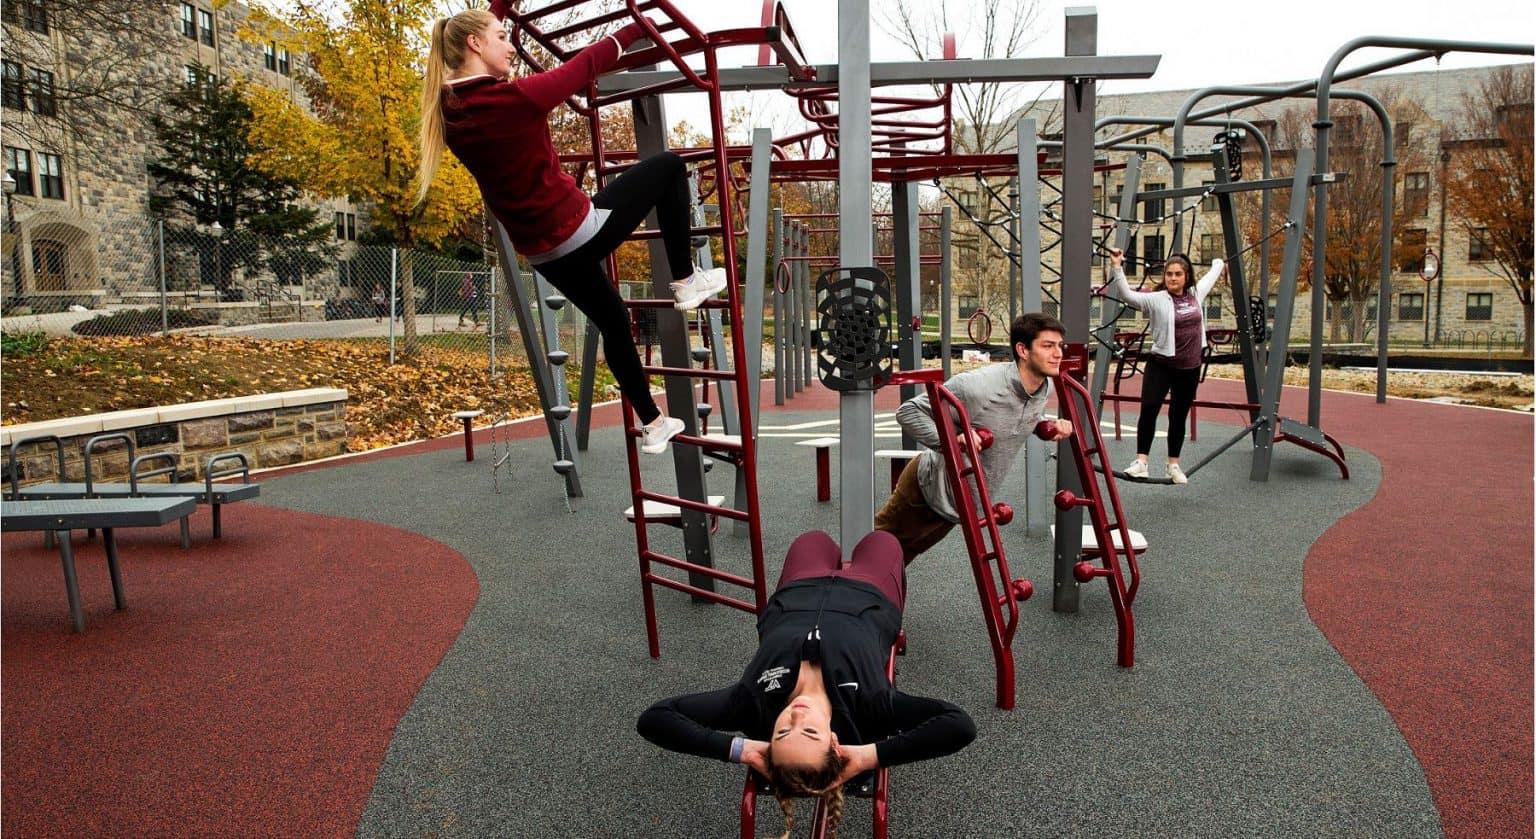 outdoor-fitness-equipment_49643261258_o-1536x839